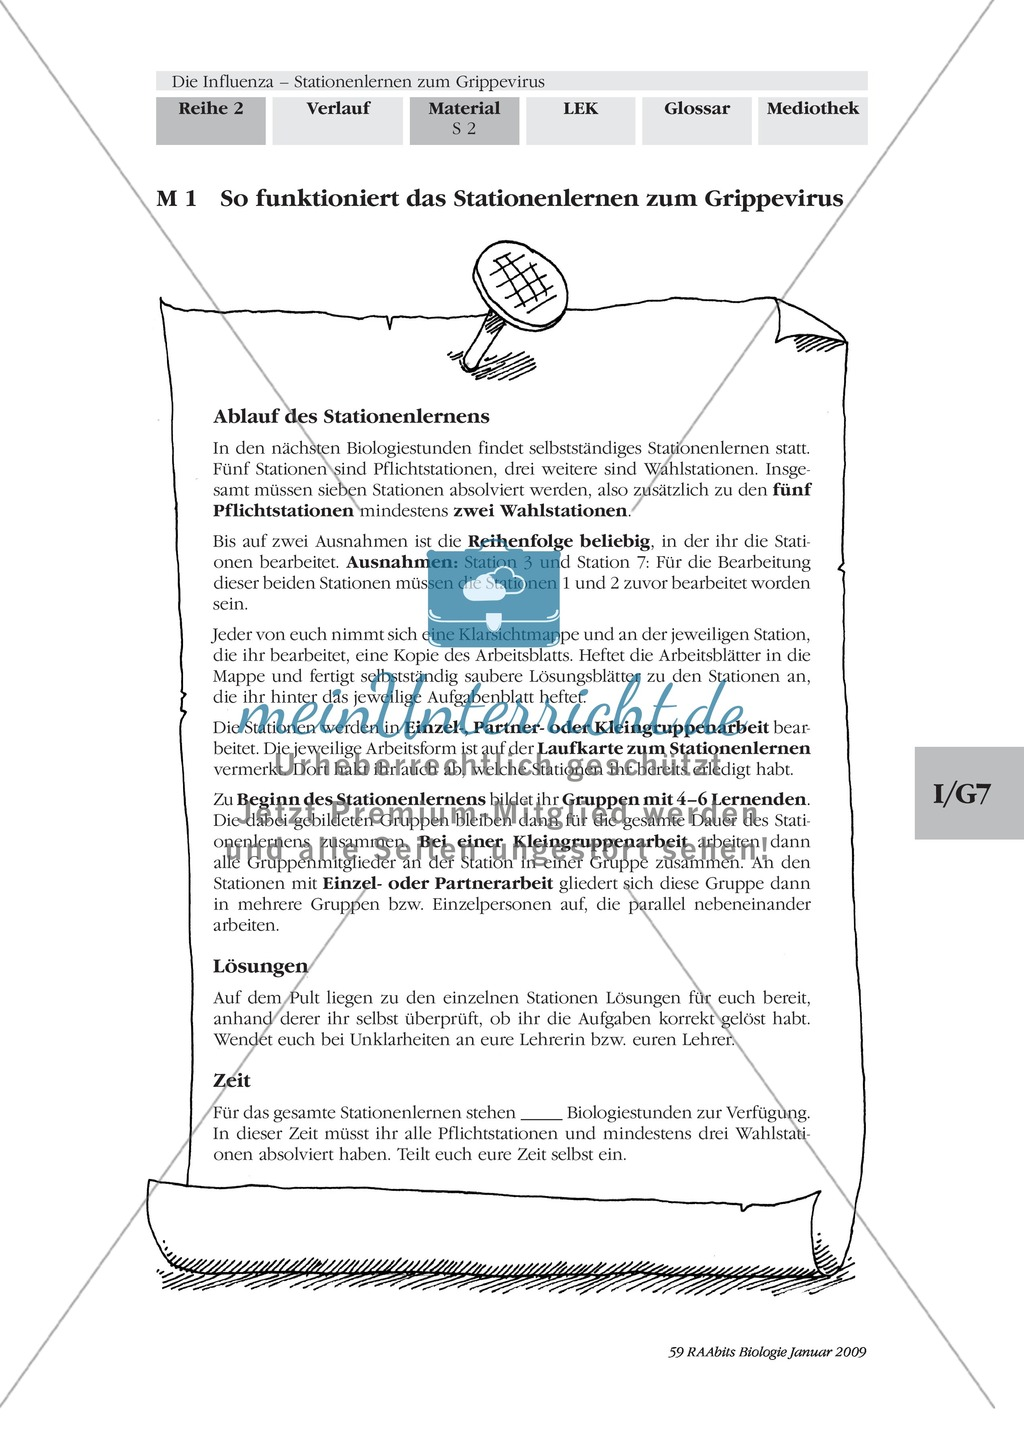 Famous Transkription Und Translation Überprüfung Arbeitsblatt ...